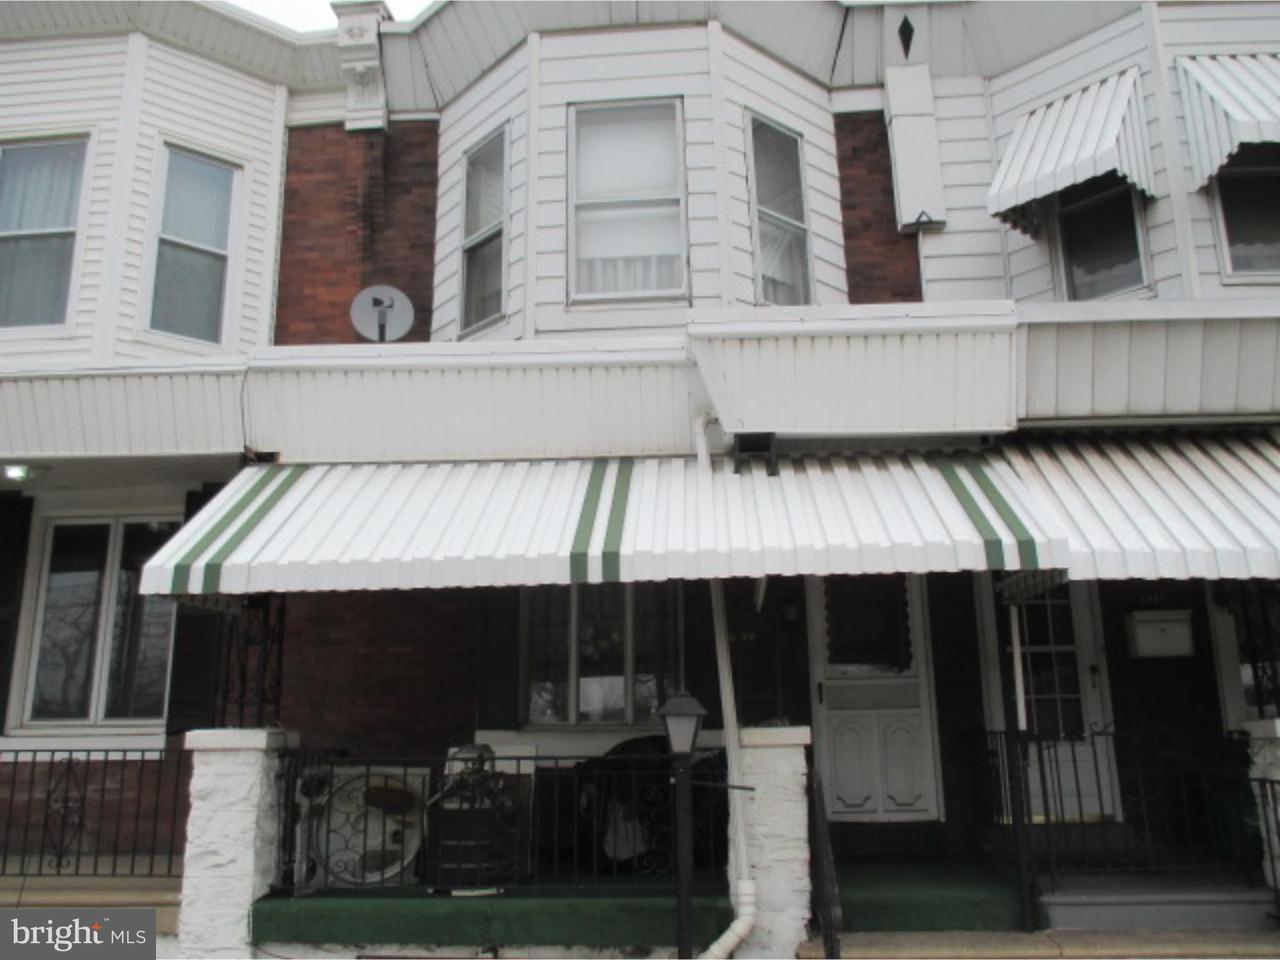 2359 E Somerset Philadelphia, PA 19134